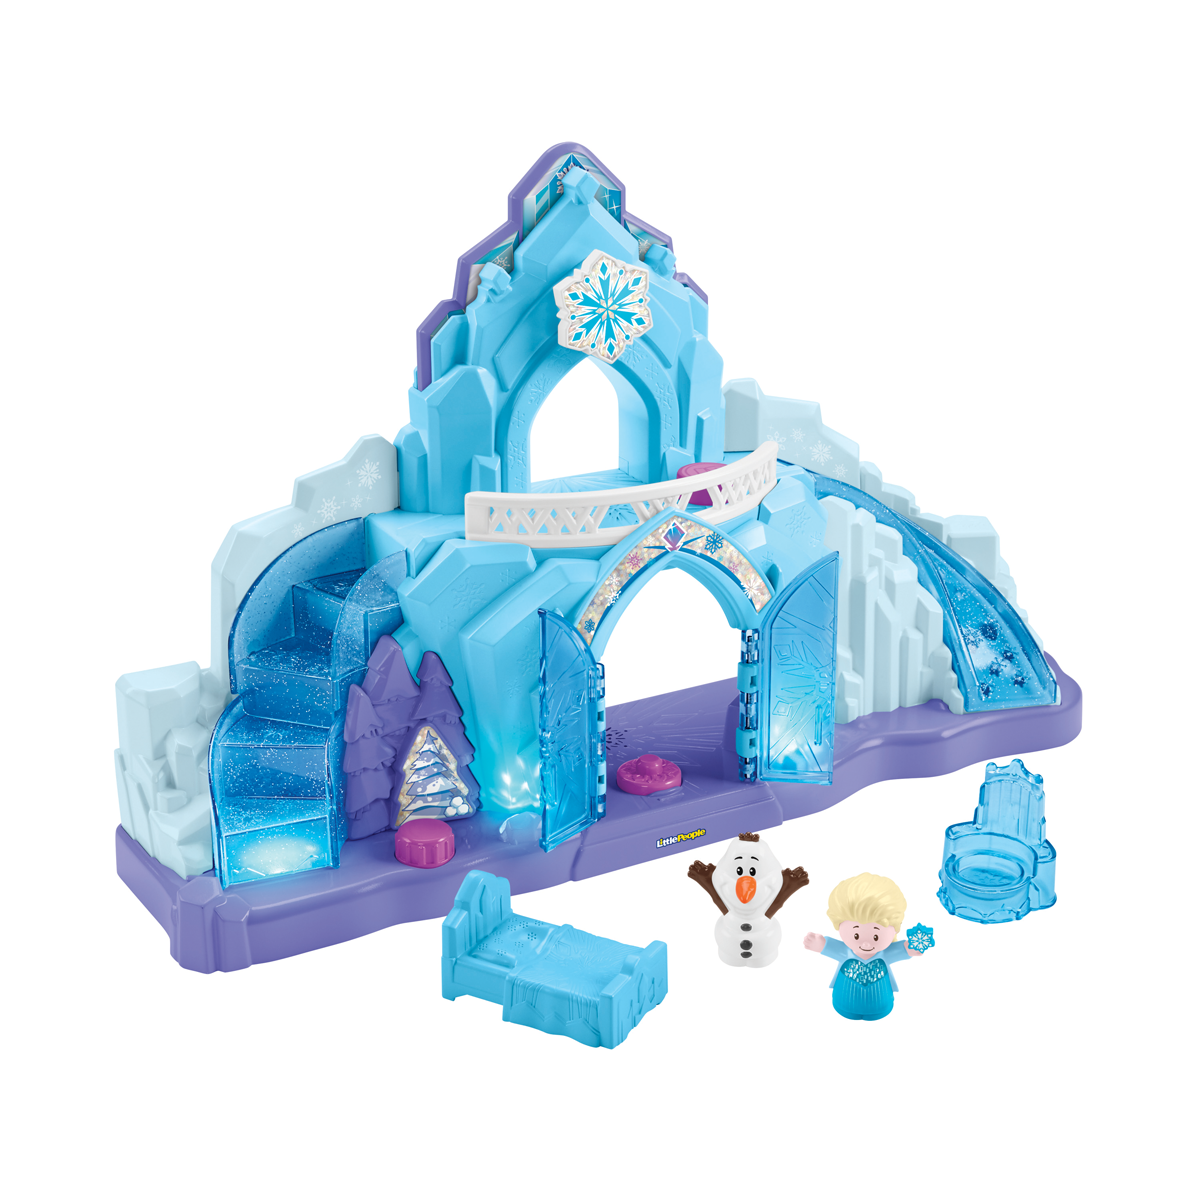 Fisher Price Little People Disney Frozen Elsa's Ice Palace